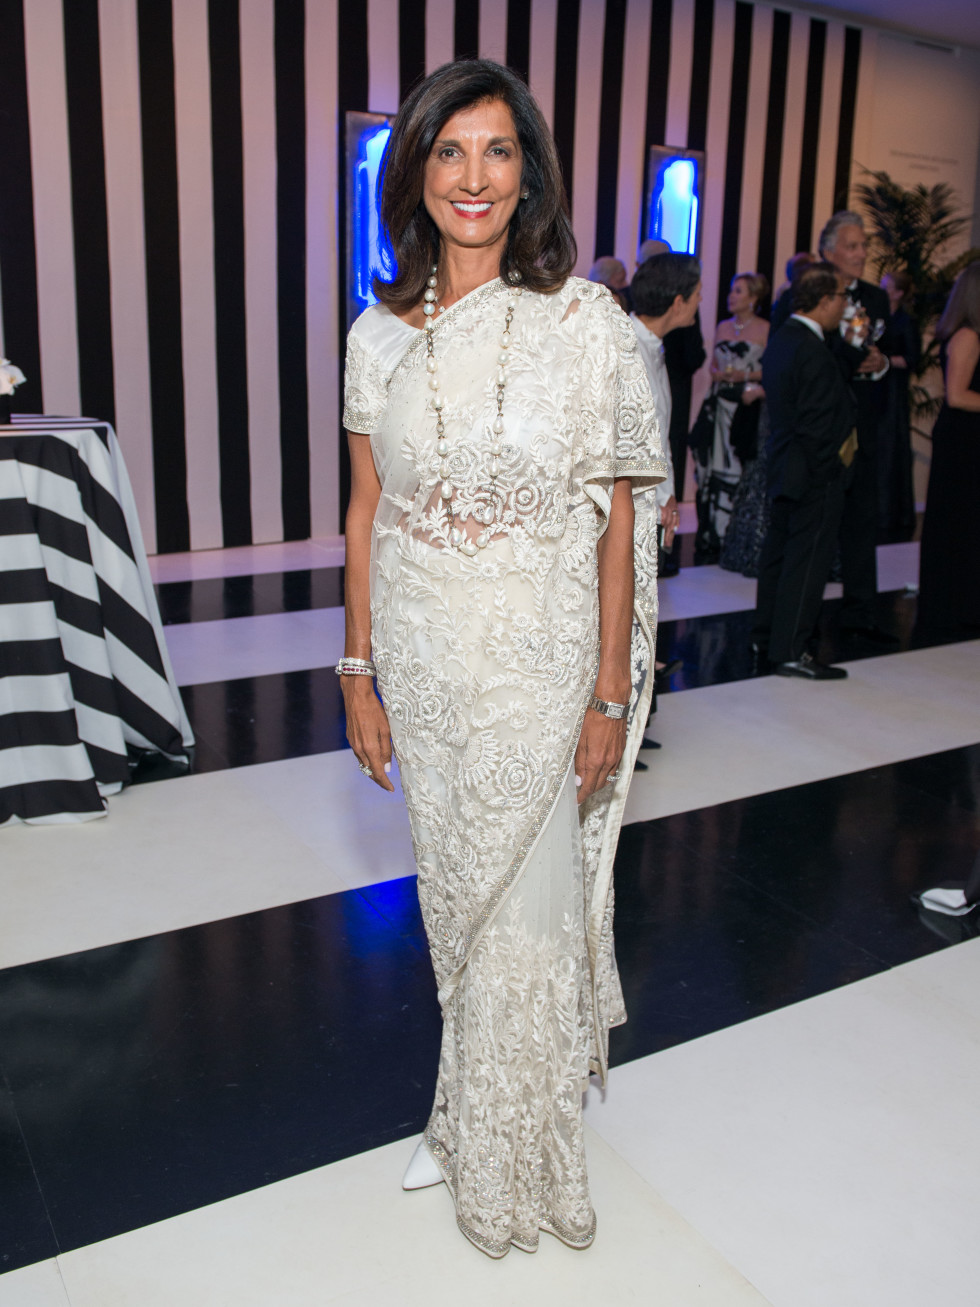 News, Shelby, MFAH gala gowns, Oct. 2015 Sultana Mangalji